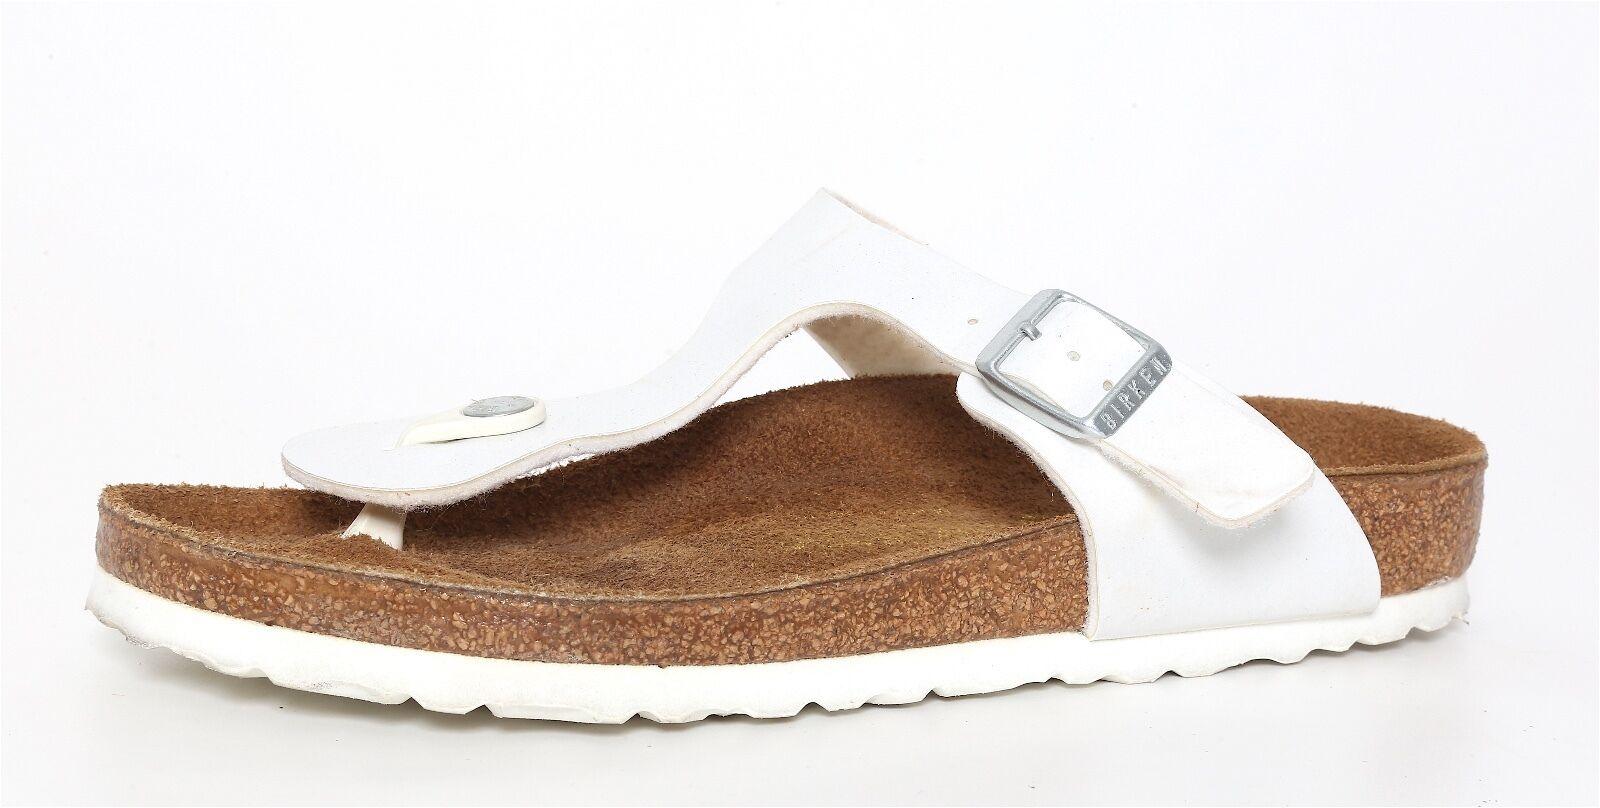 Birkenstock Gizeh Size White 245 Sandals 3247 Size Gizeh 38 EU L7 M5 dc4f0e